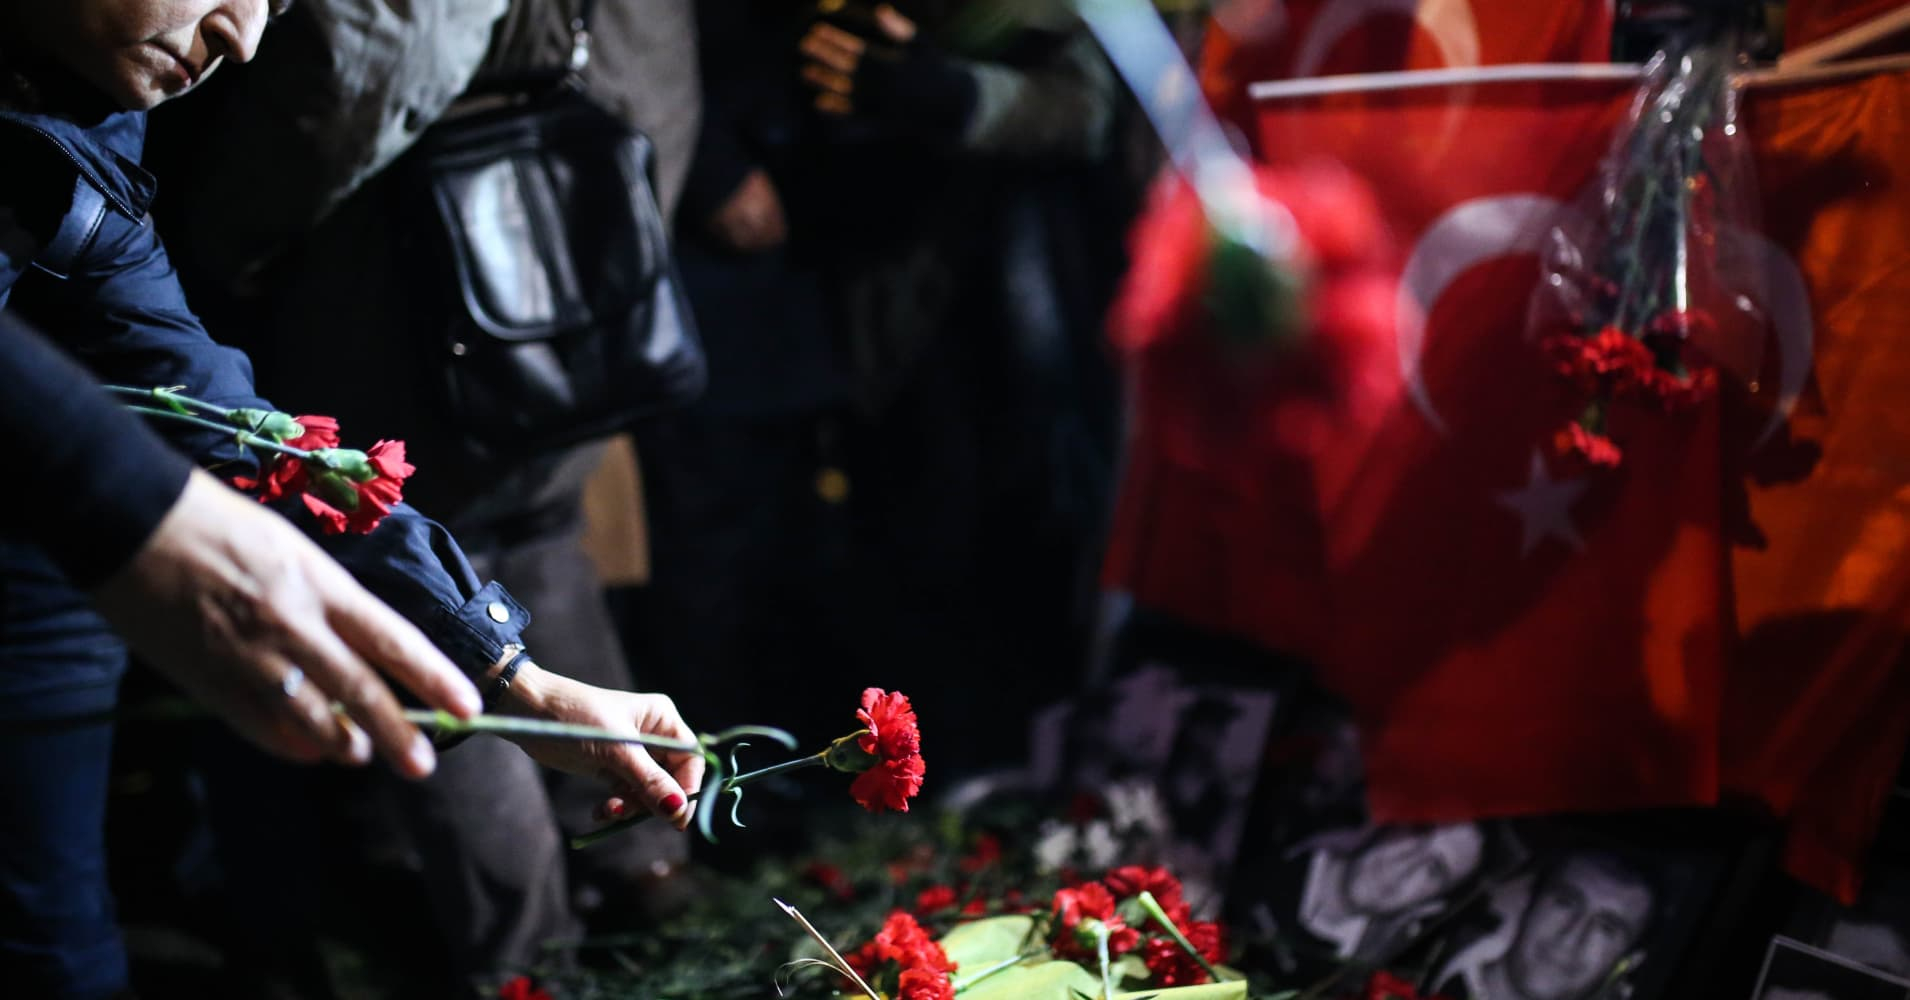 c41937d70b82 presstelegram.com Turkey says identity of Istanbul attacker established